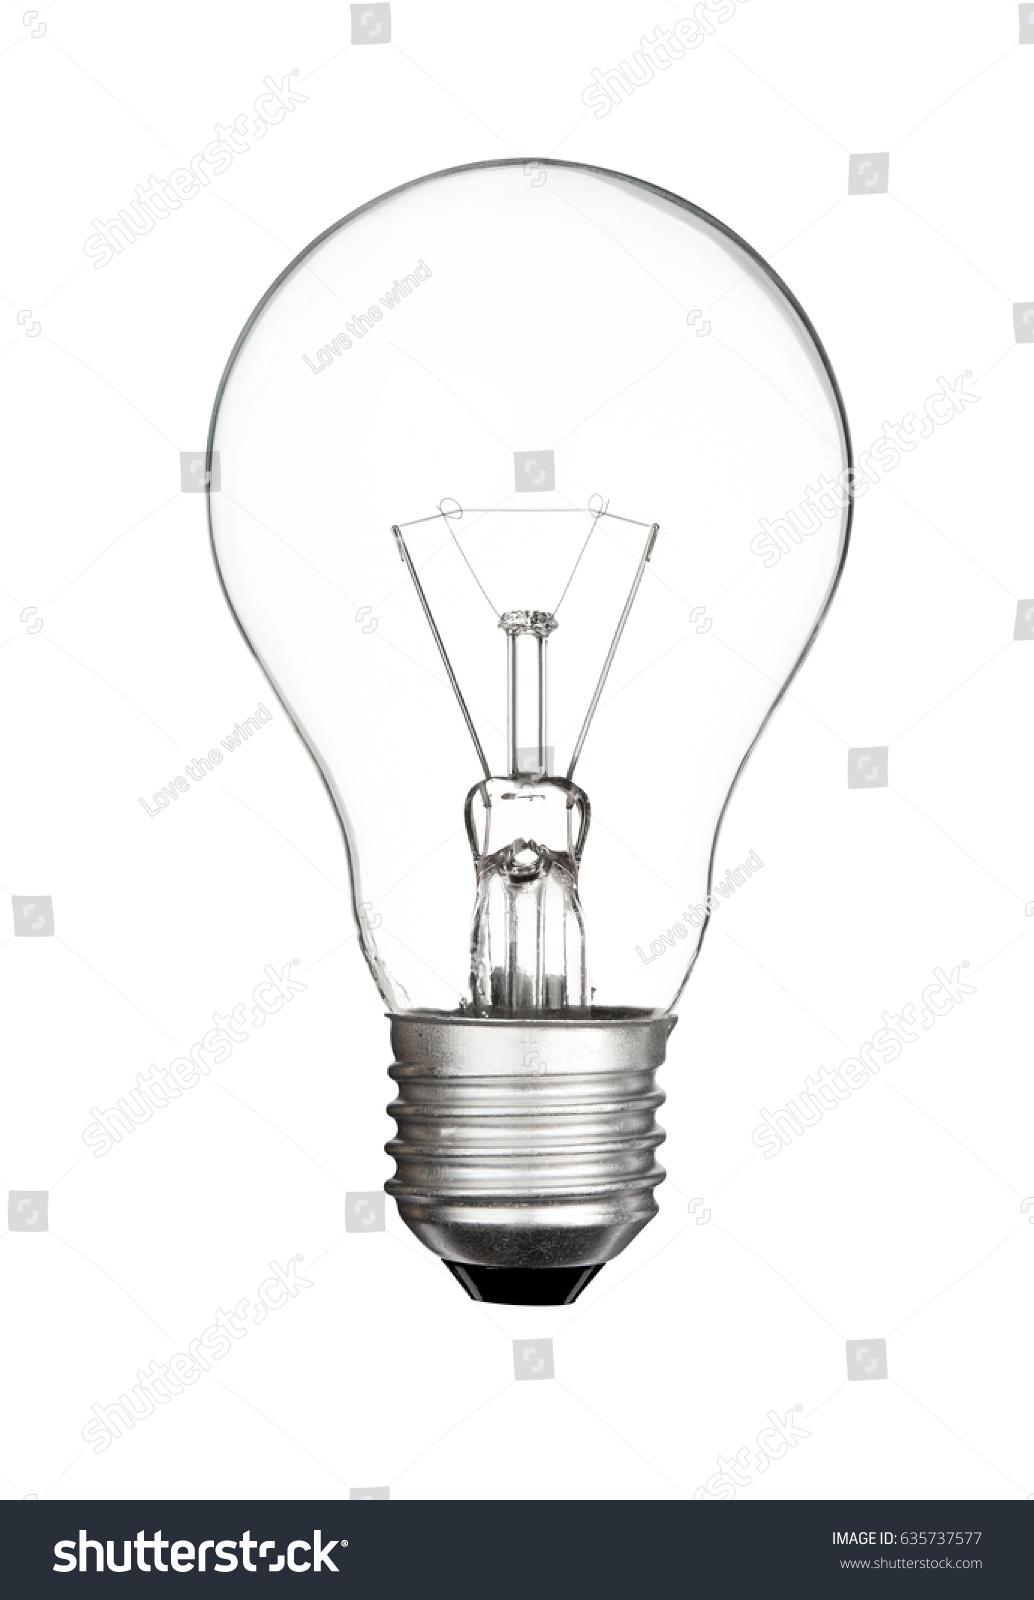 Bulb Ez Canvas Incandescent Light Diagram